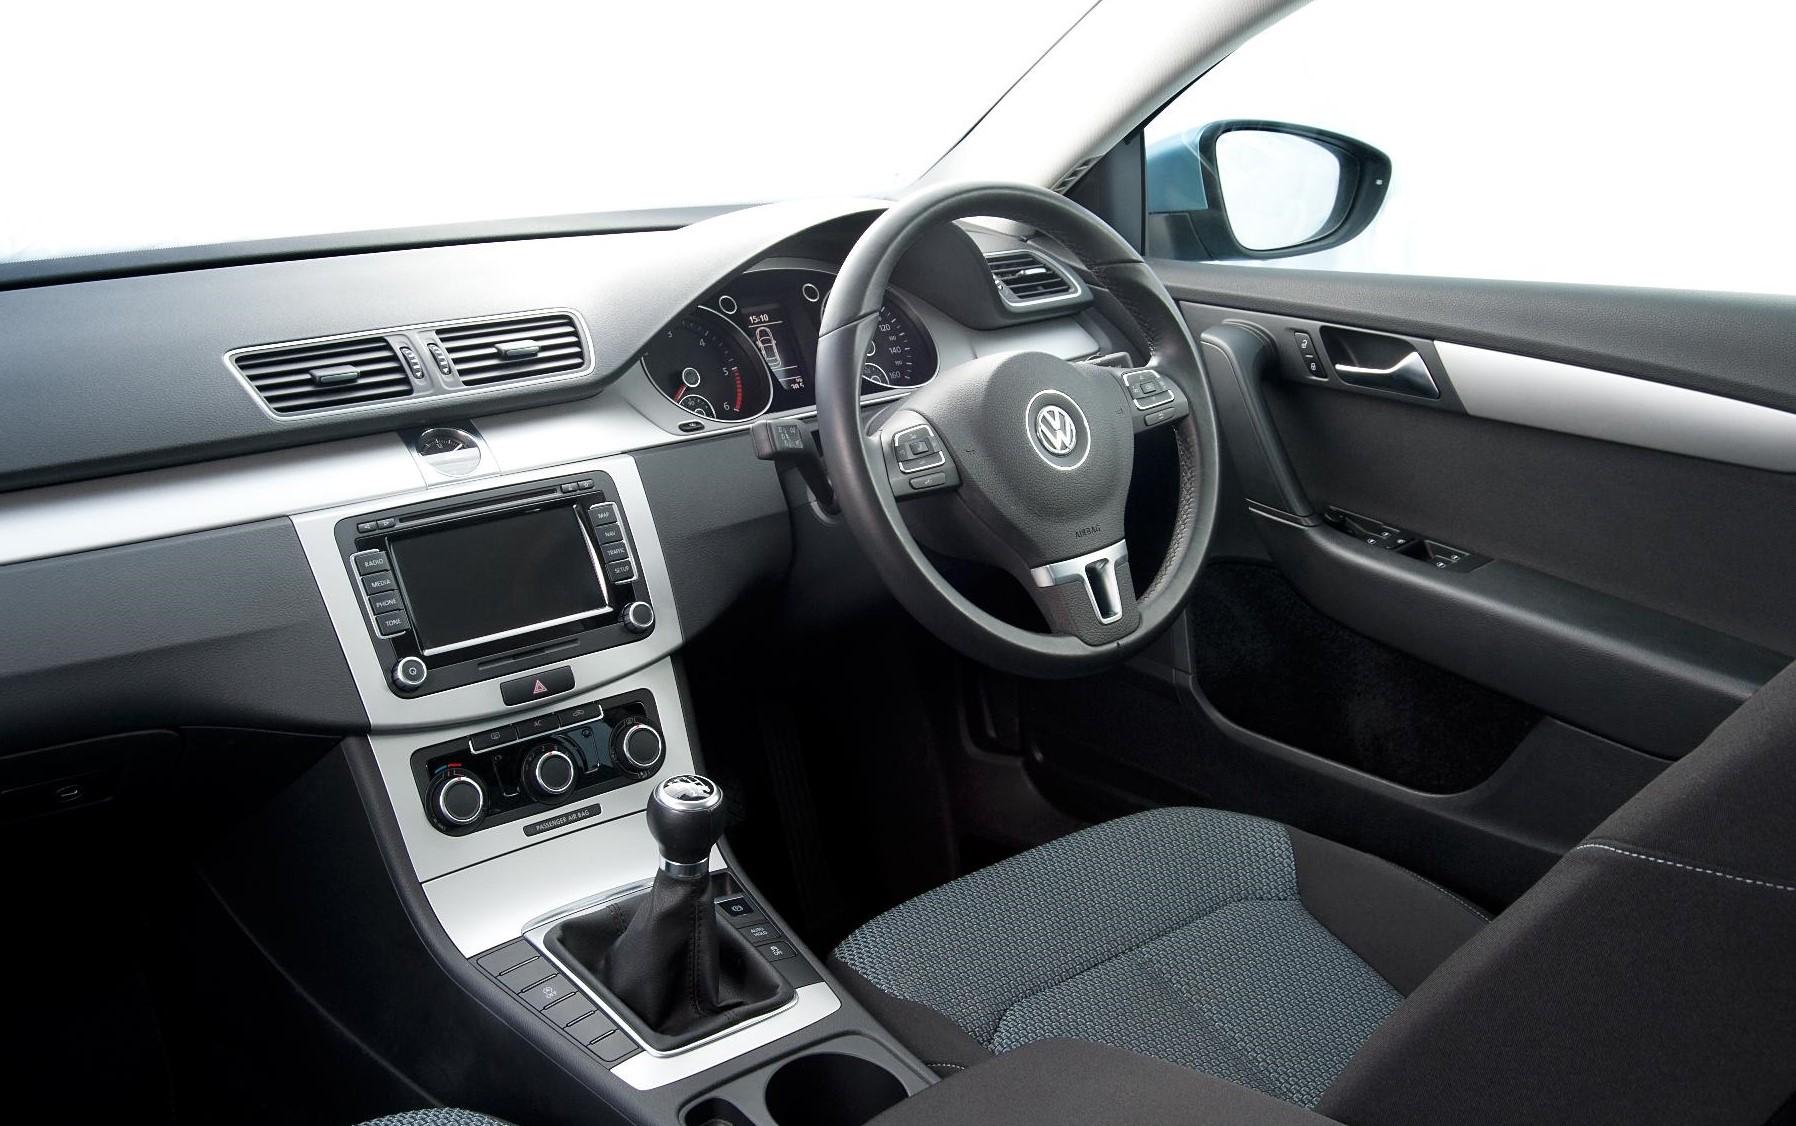 Vauxhall Passat dashboard interior